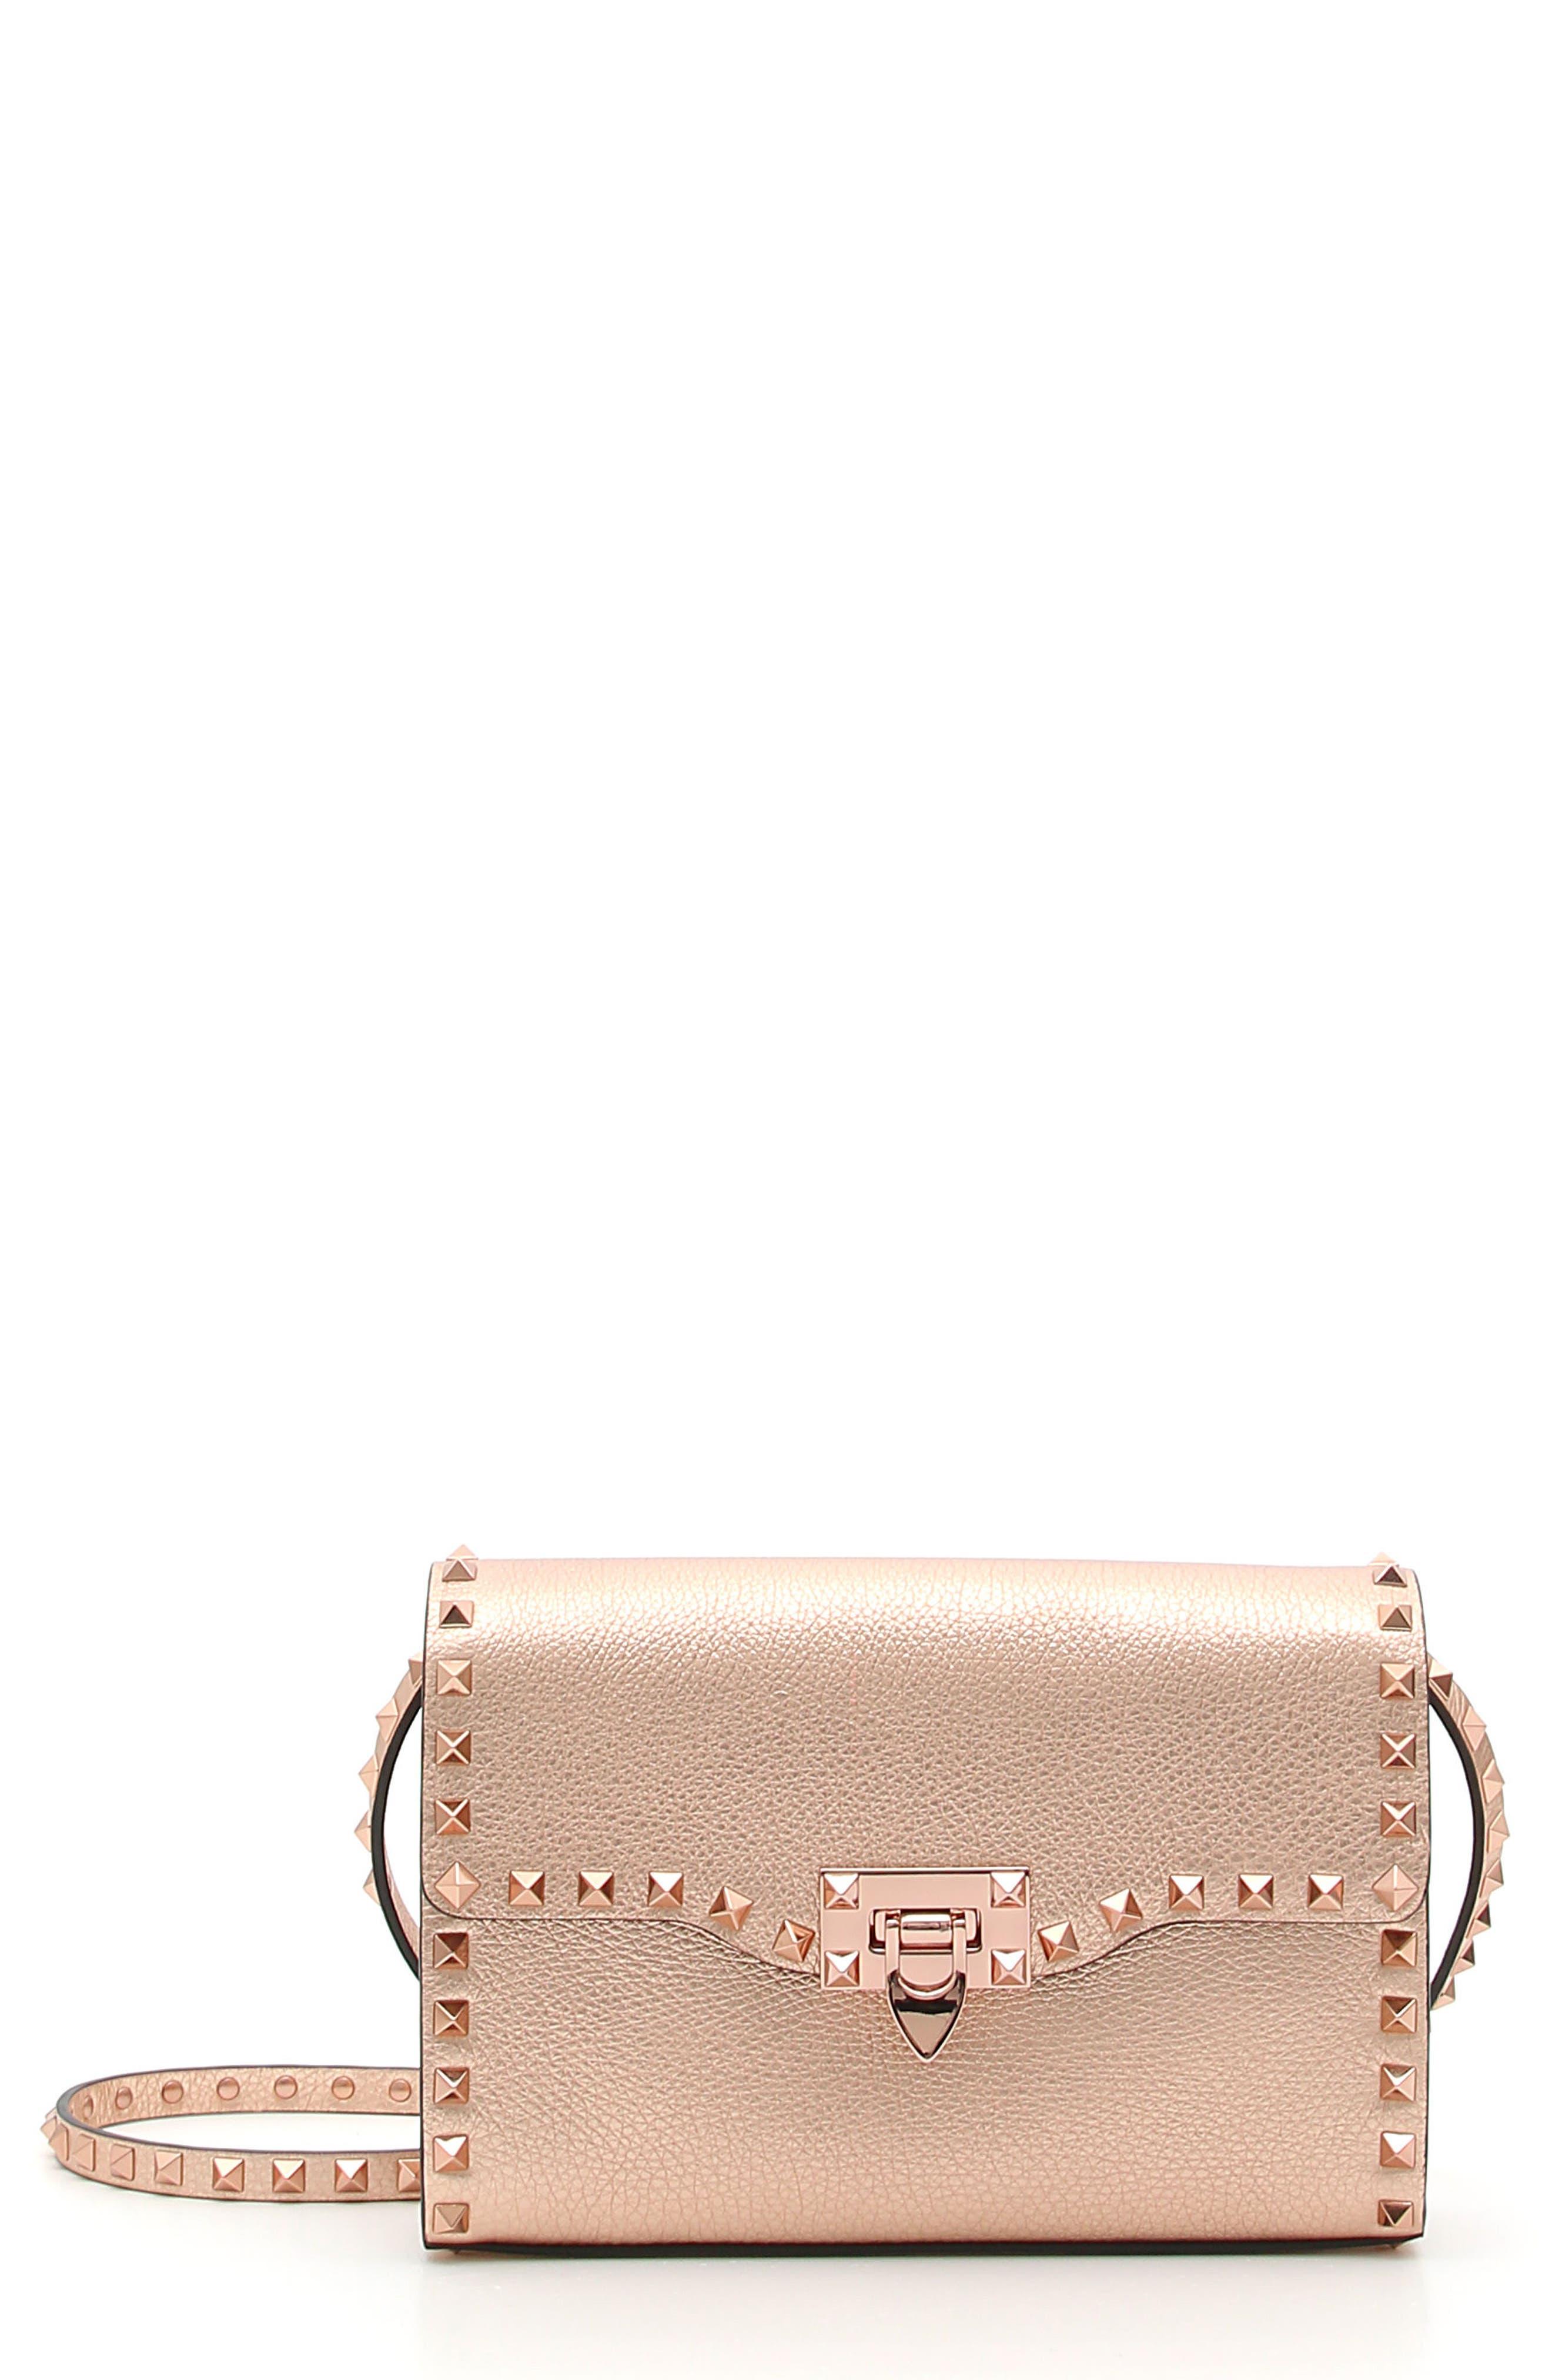 Rockstud Medium Metallic Leather Shoulder Bag,                             Main thumbnail 1, color,                             682